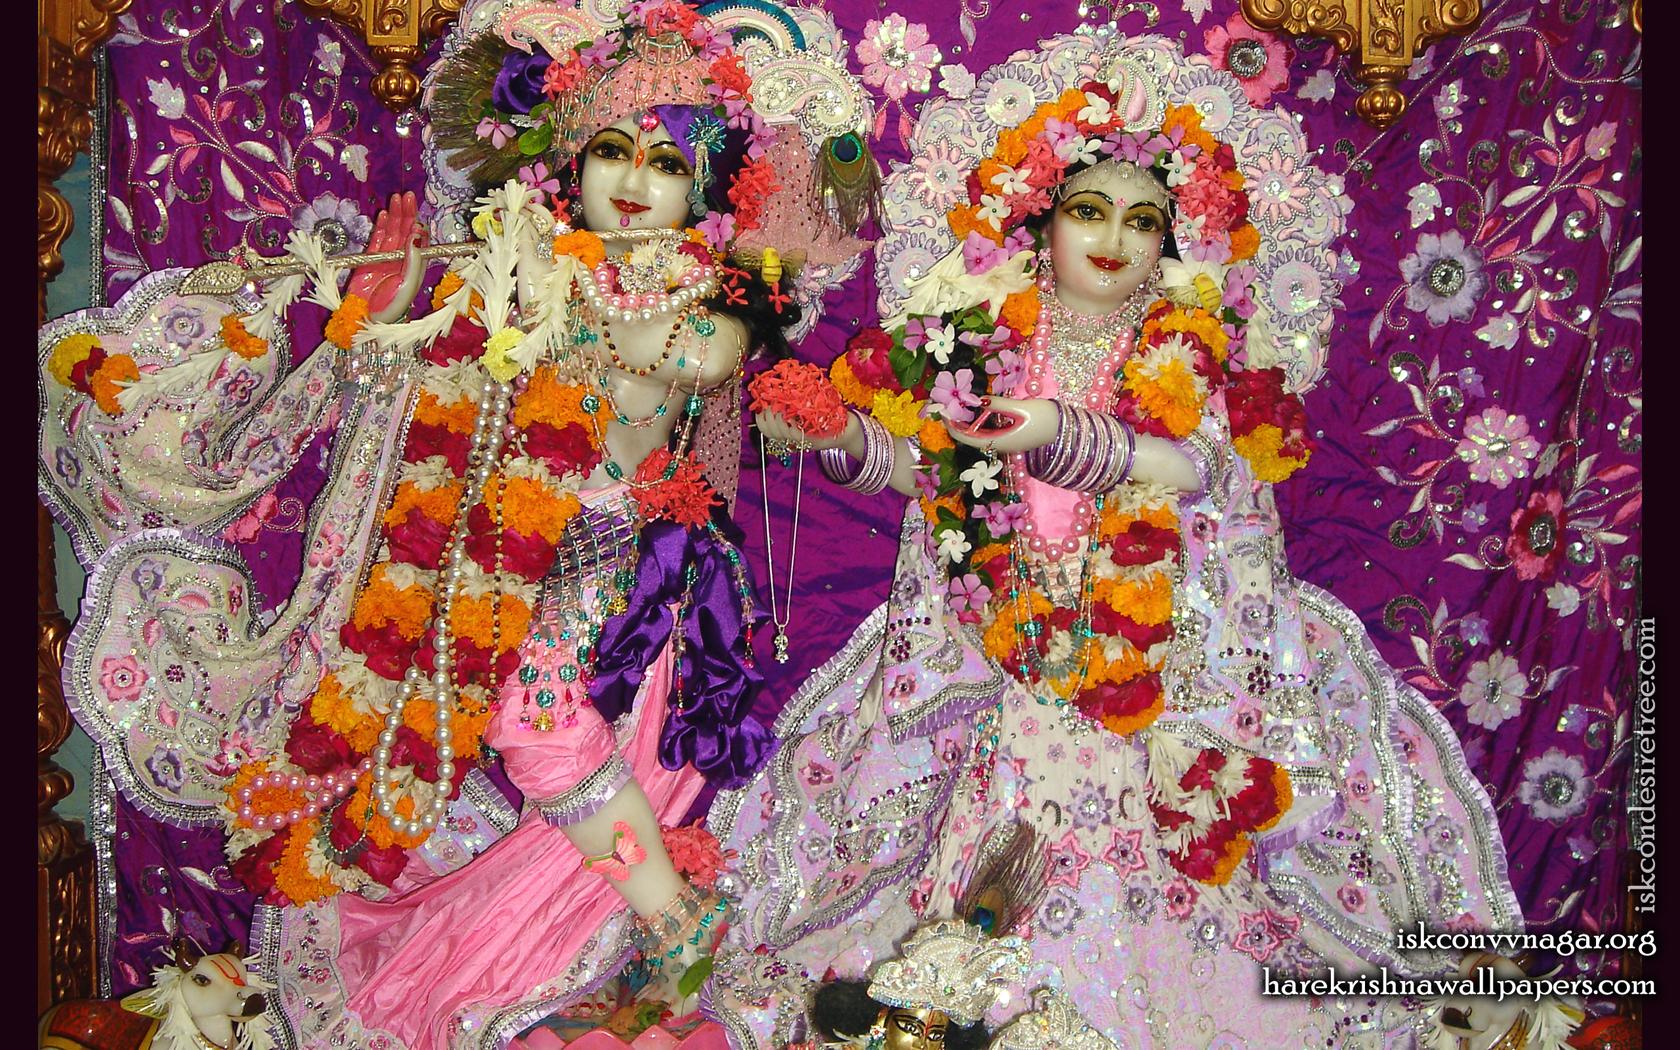 Sri Sri Radha Giridhari Wallpaper (014) Size 1680x1050 Download